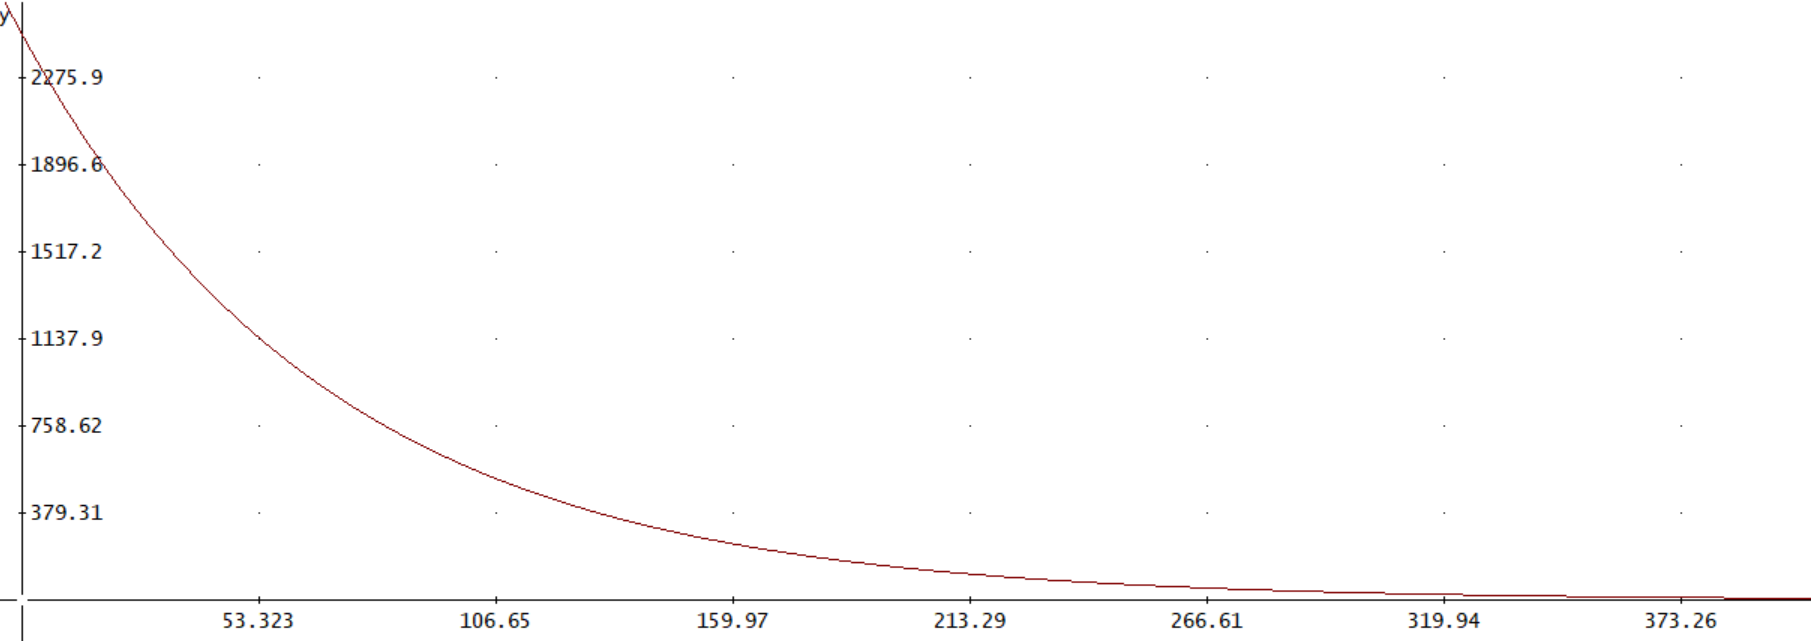 DAD token distribution per hour vs time